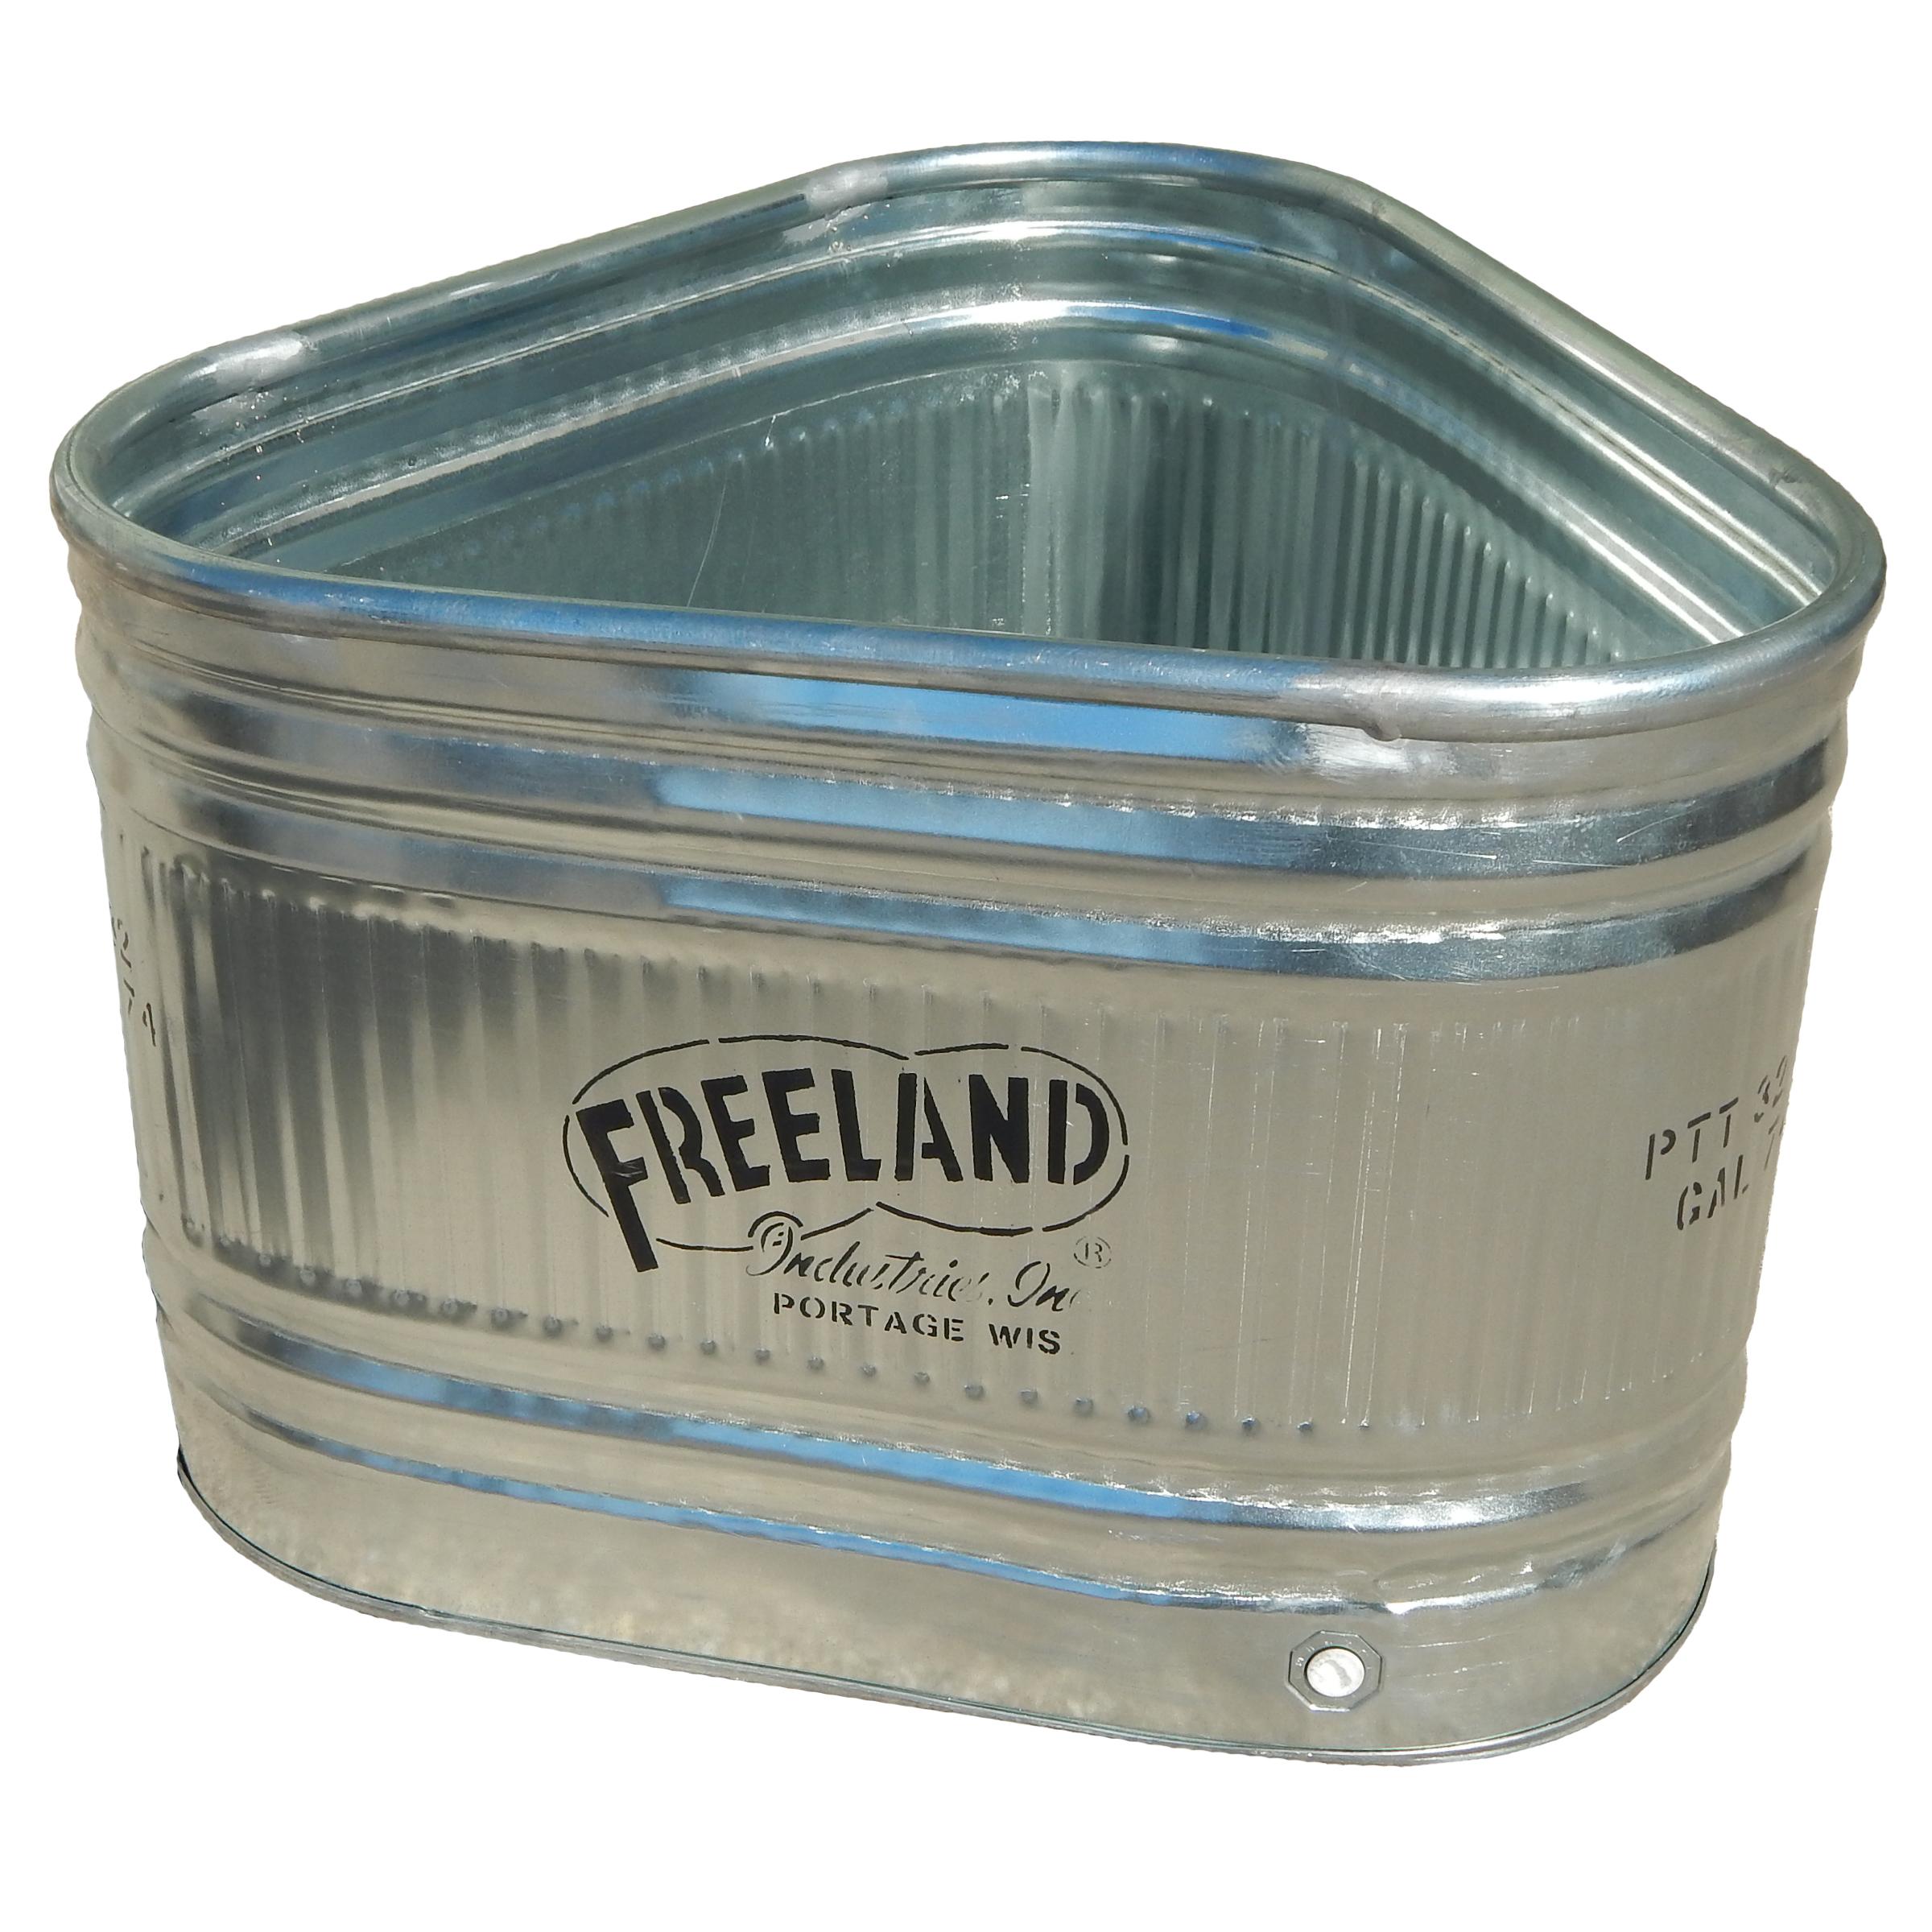 Murdoch's – Freeland Industries - Three-Sided Galvanized